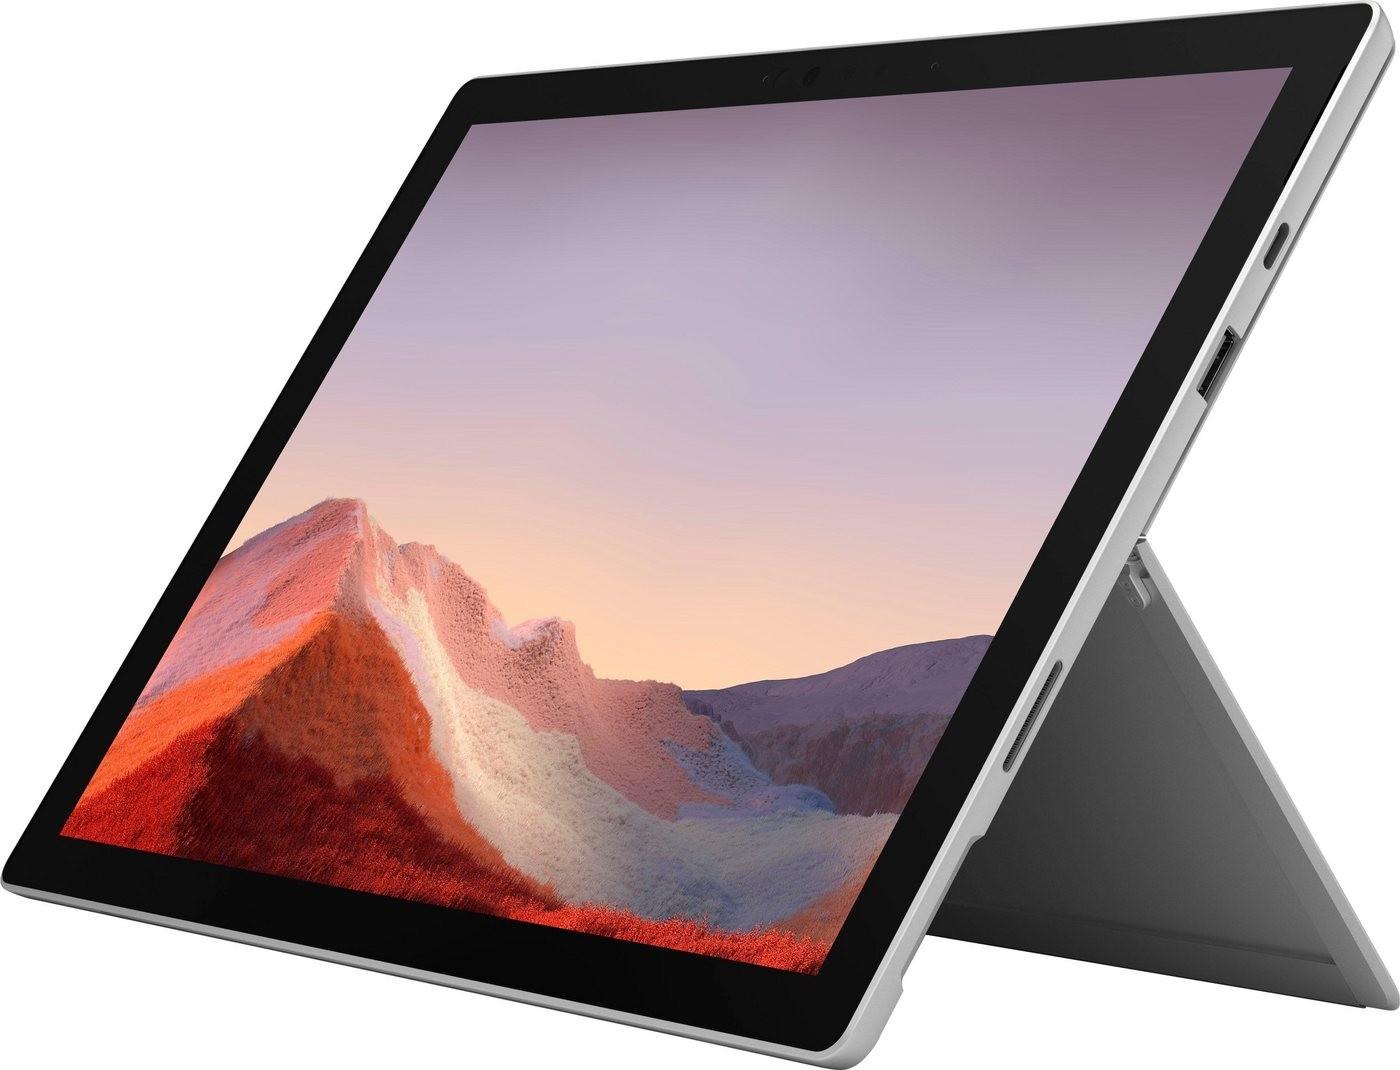 Microsoft Surface Pro 7 Platin Tablet, 12.3 Zoll, i7-1065G7 4x 1.30GHz, 16GB RAM, 1TB SSD